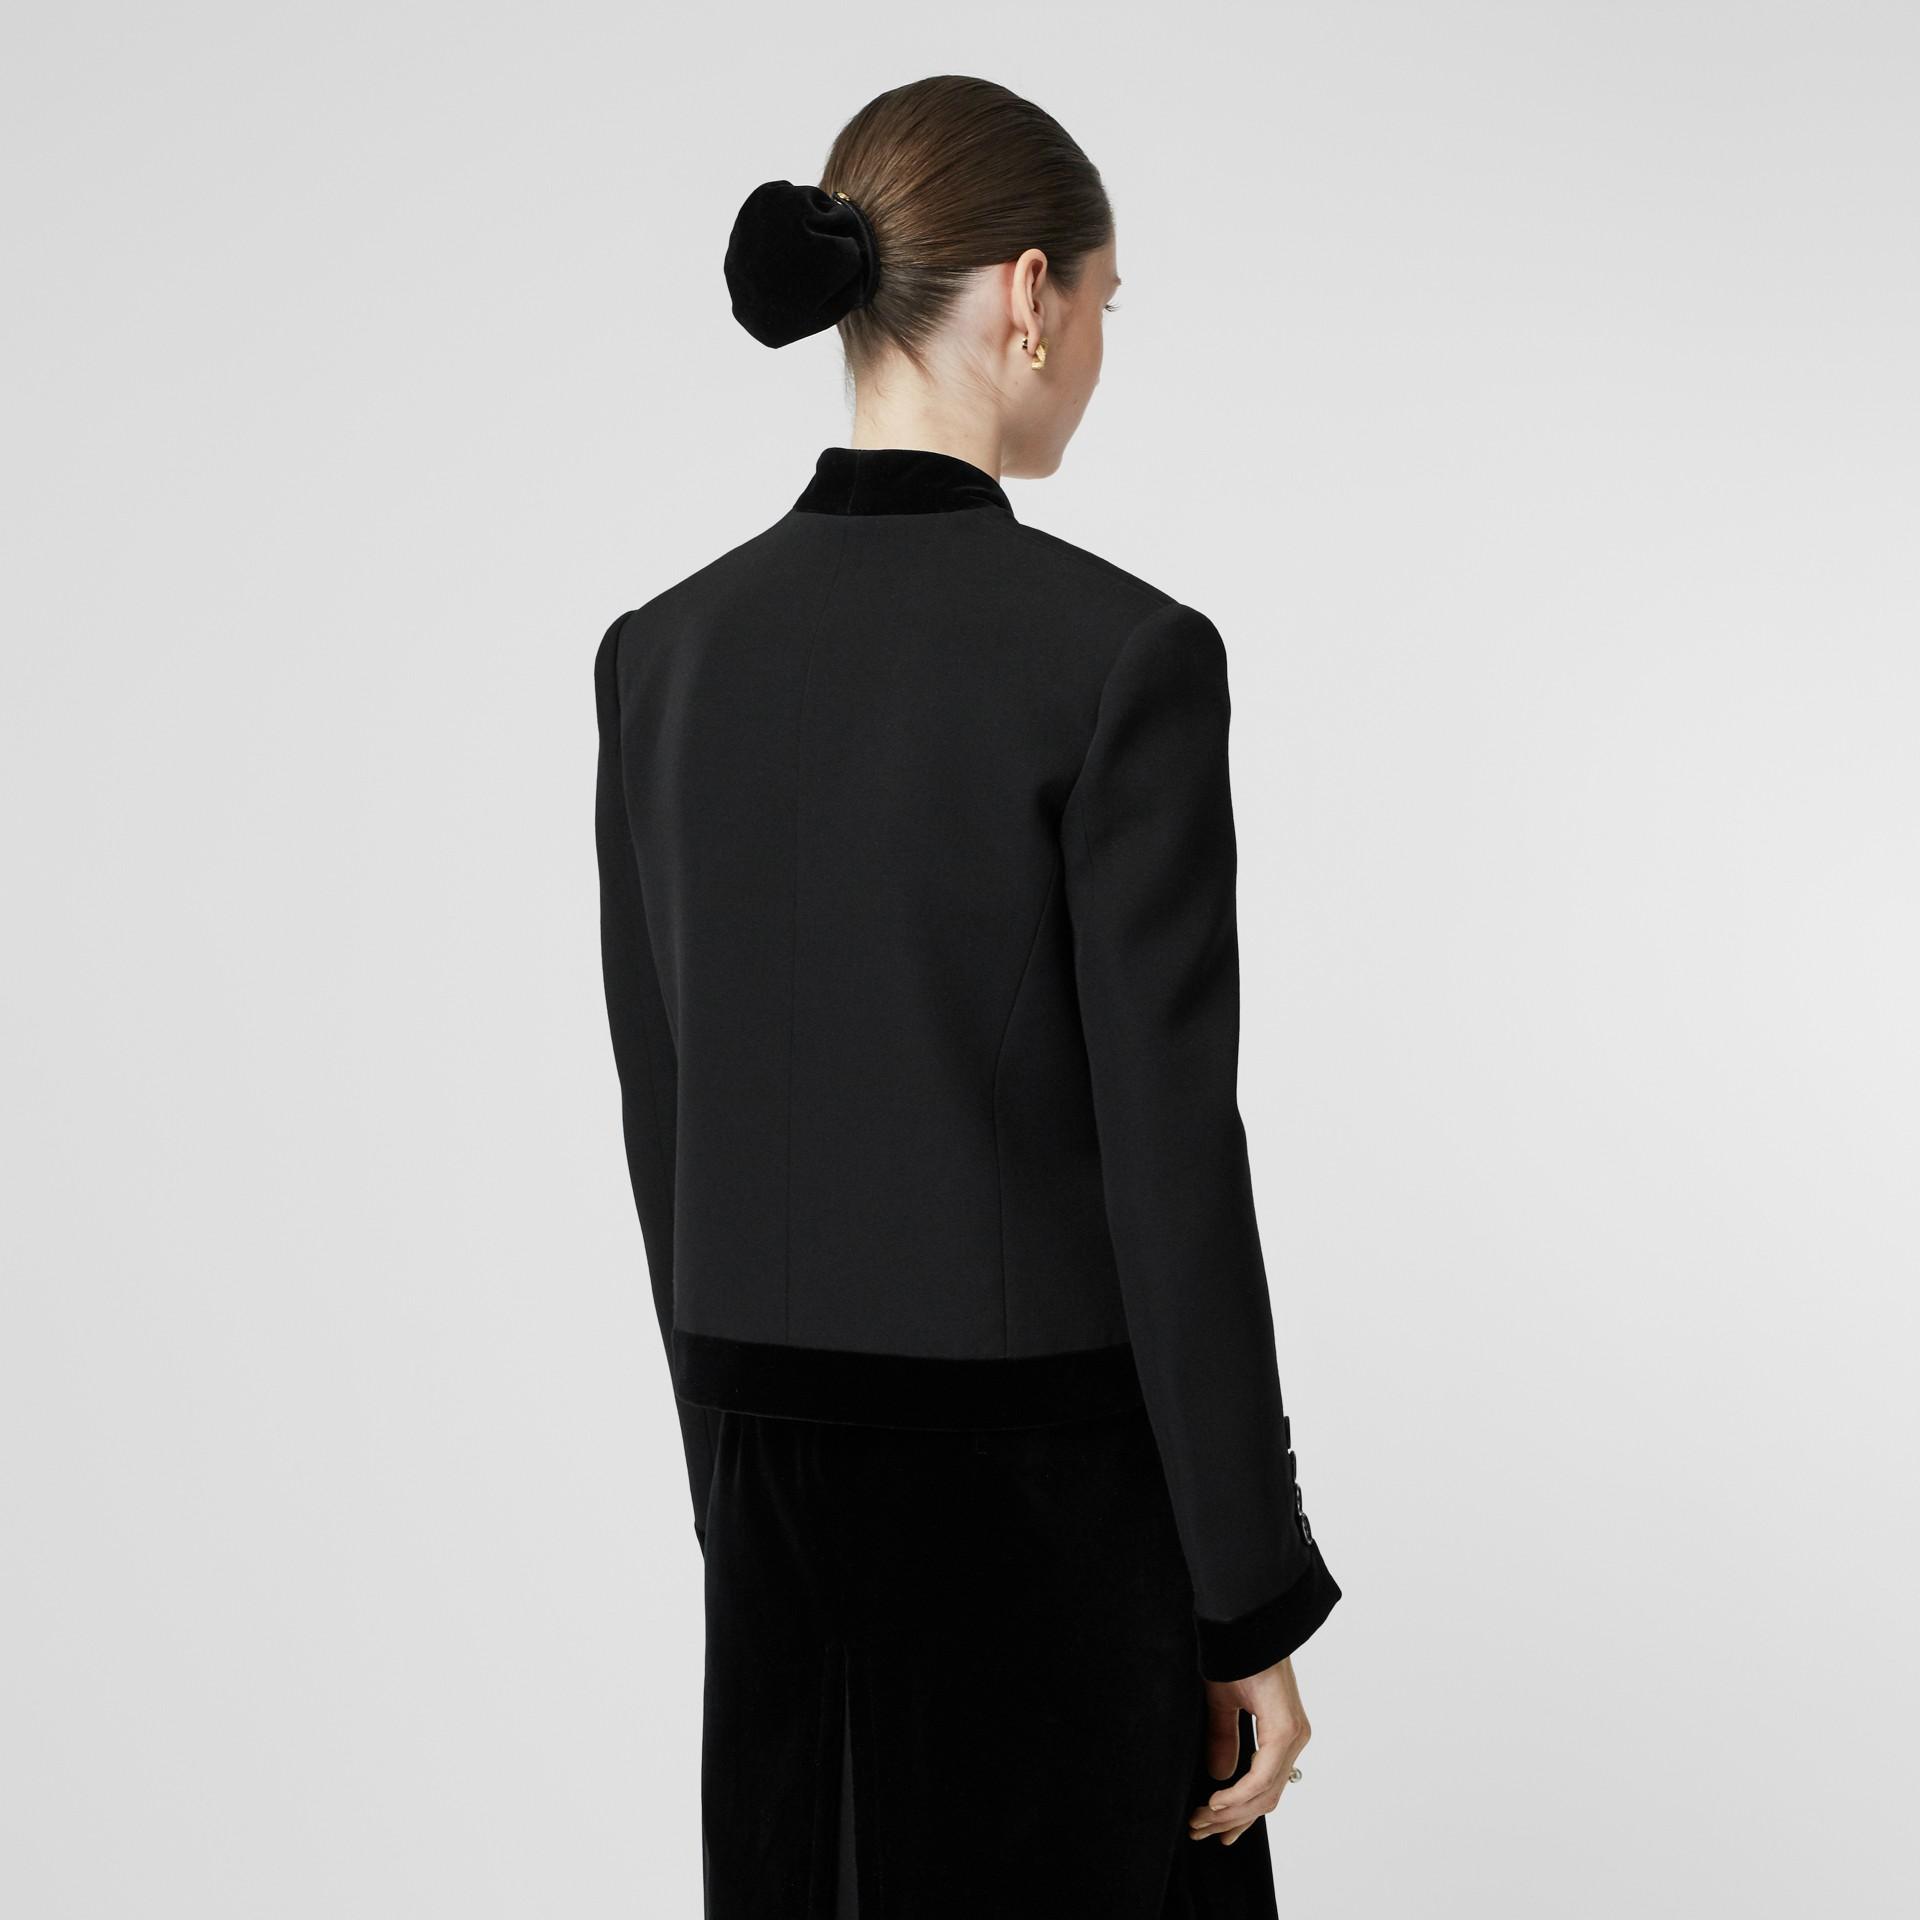 Velvet Detail Wool Tailored Jacket in Black - Women | Burberry - gallery image 2